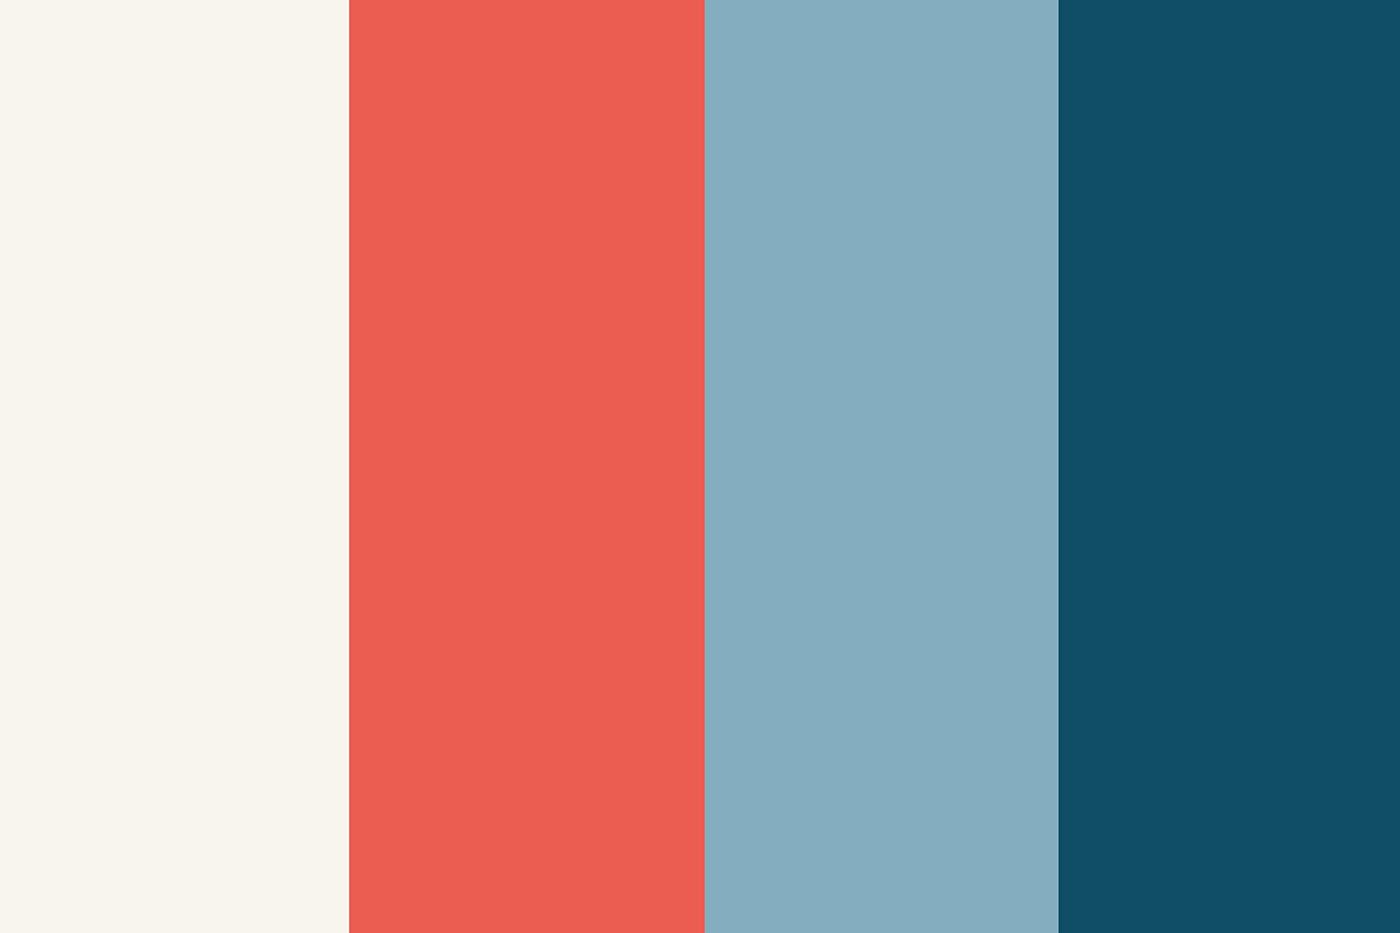 branding  identity graphic design  Logotype Visual Systems architecture brand identity studio colors architect studio